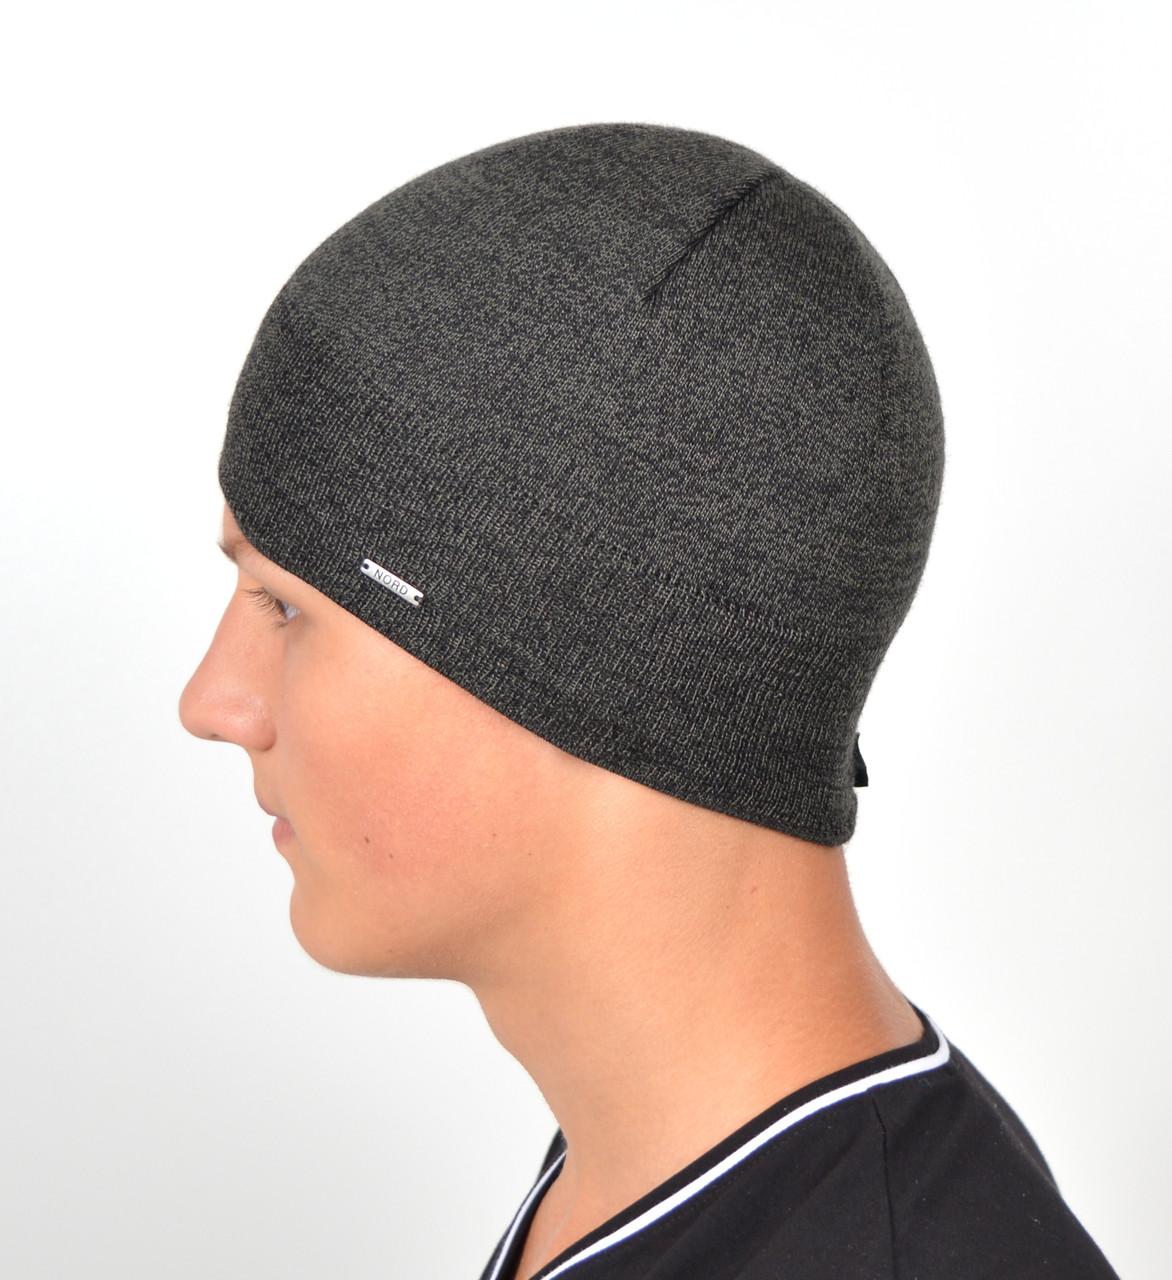 Мужская вязаная шапка Норд на флисе 15046-Серый меланж